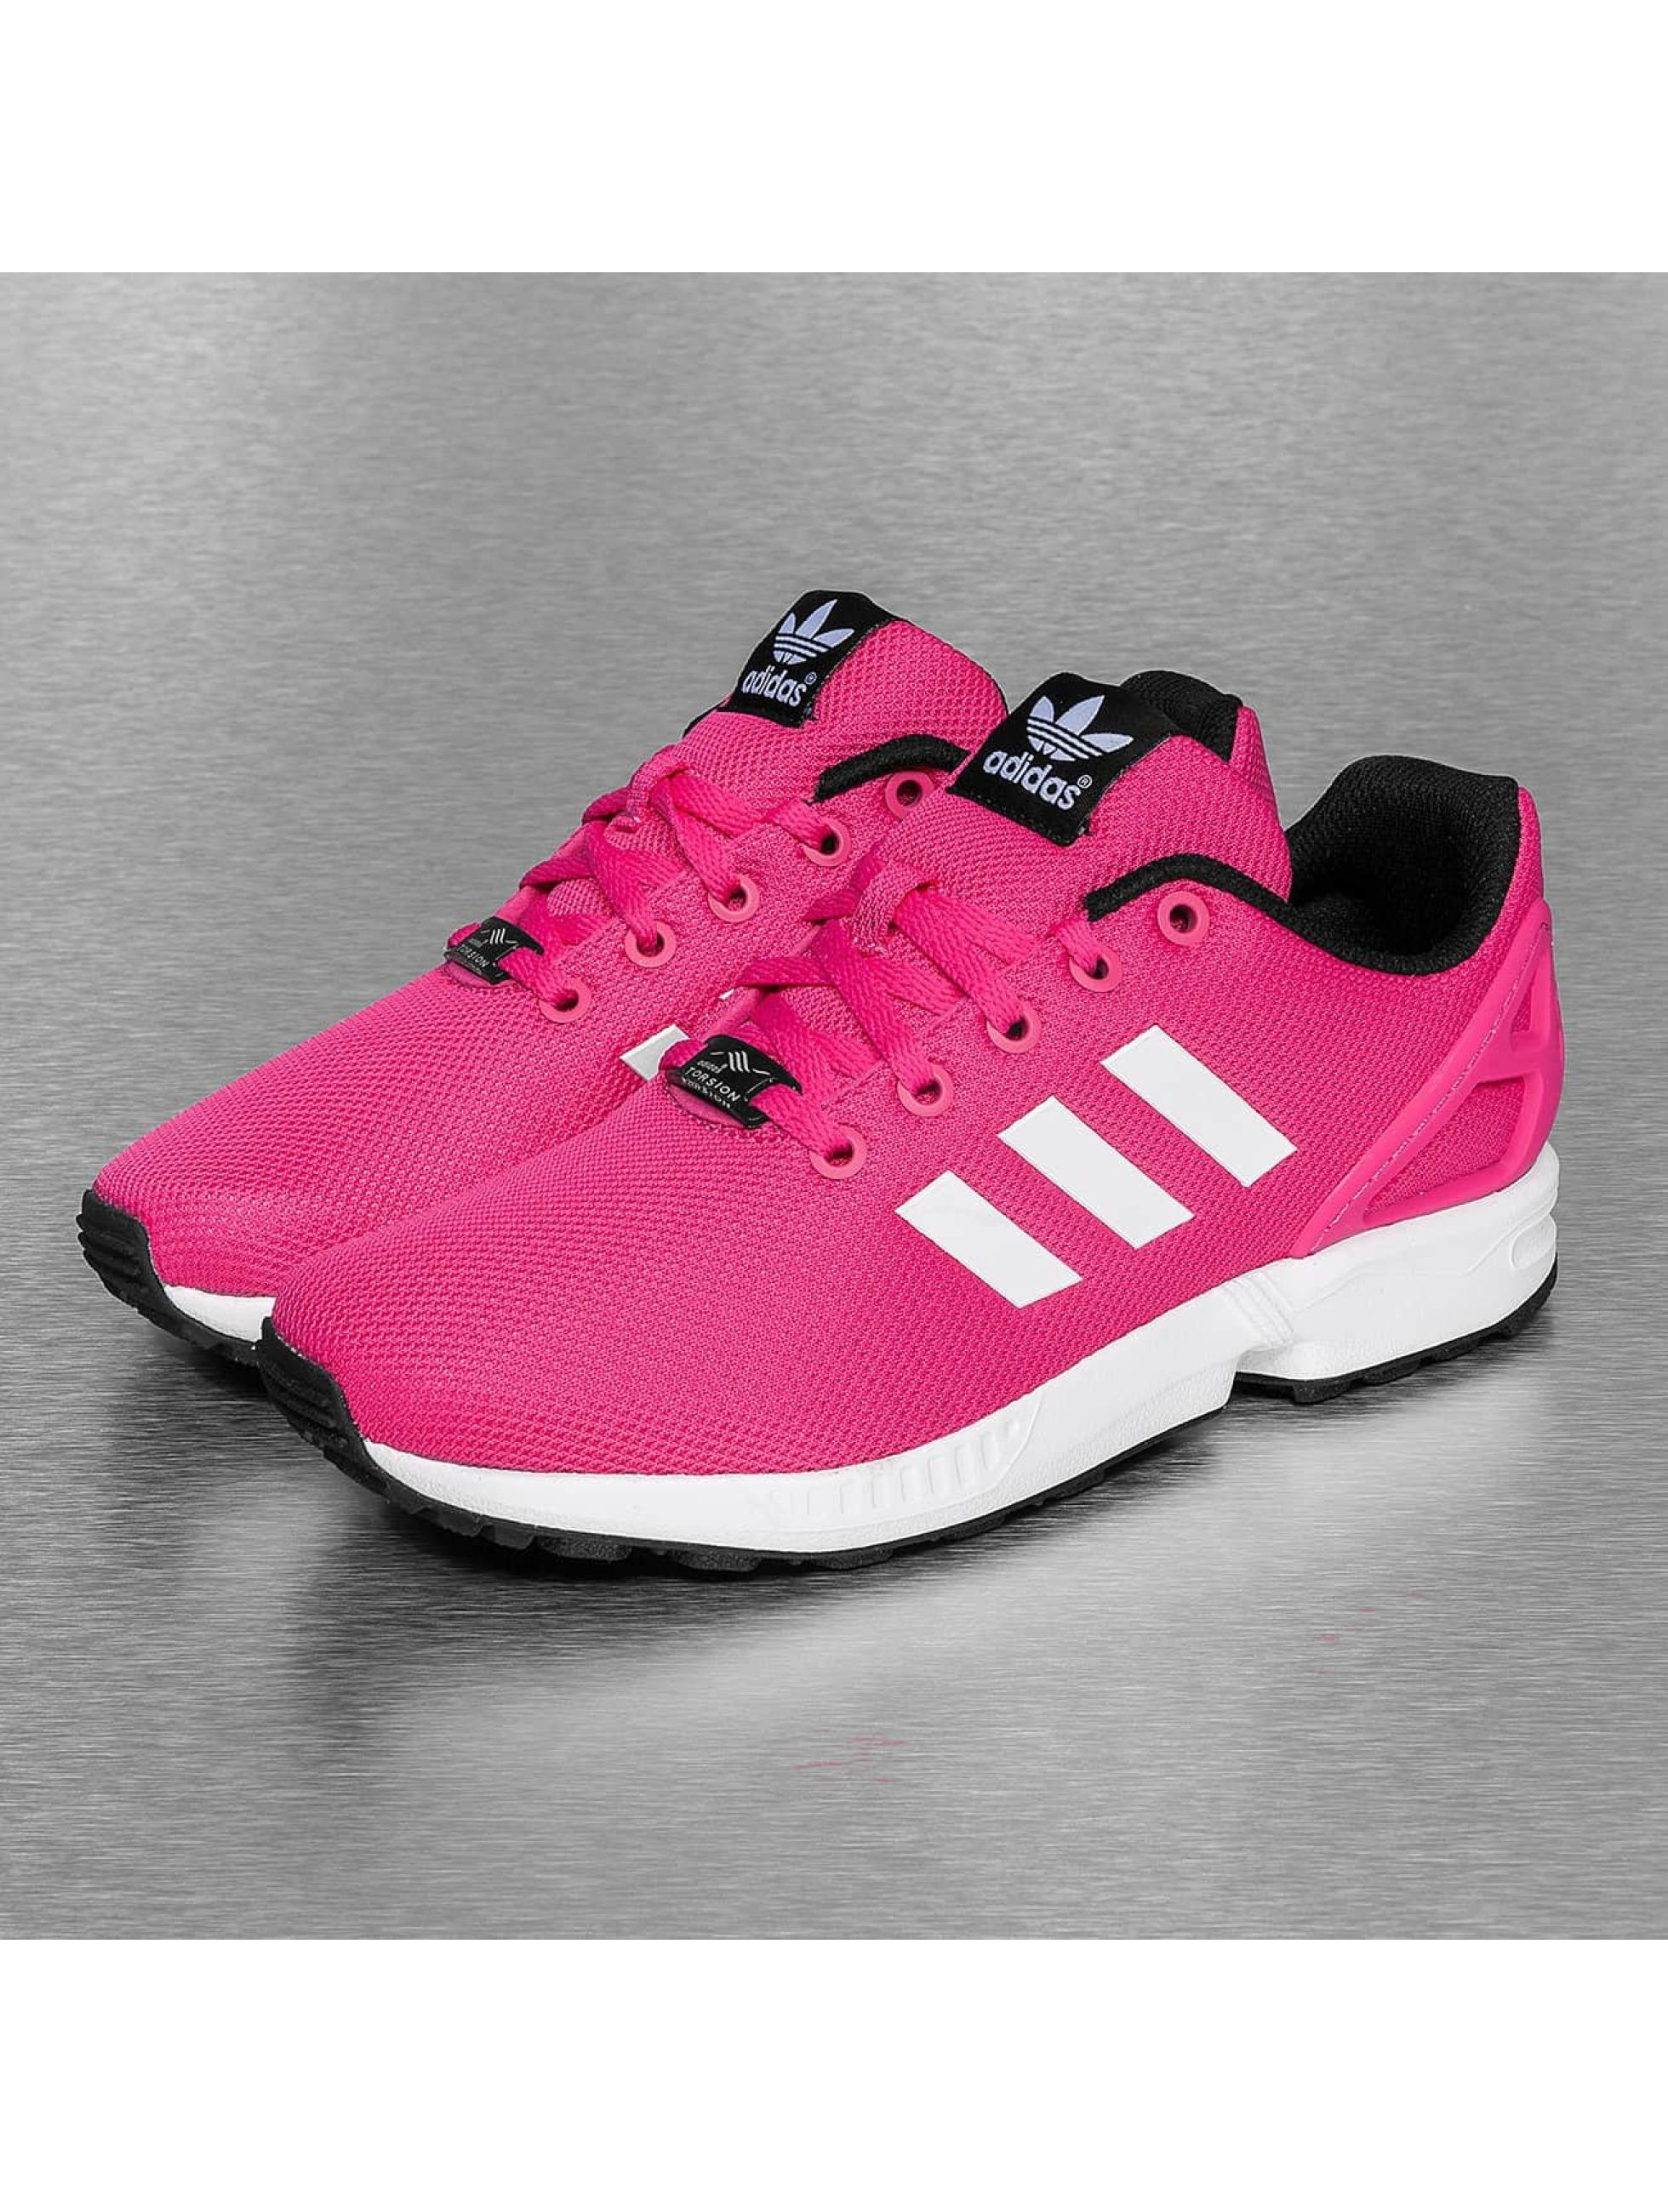 Adidas Kinderschuhe Pink